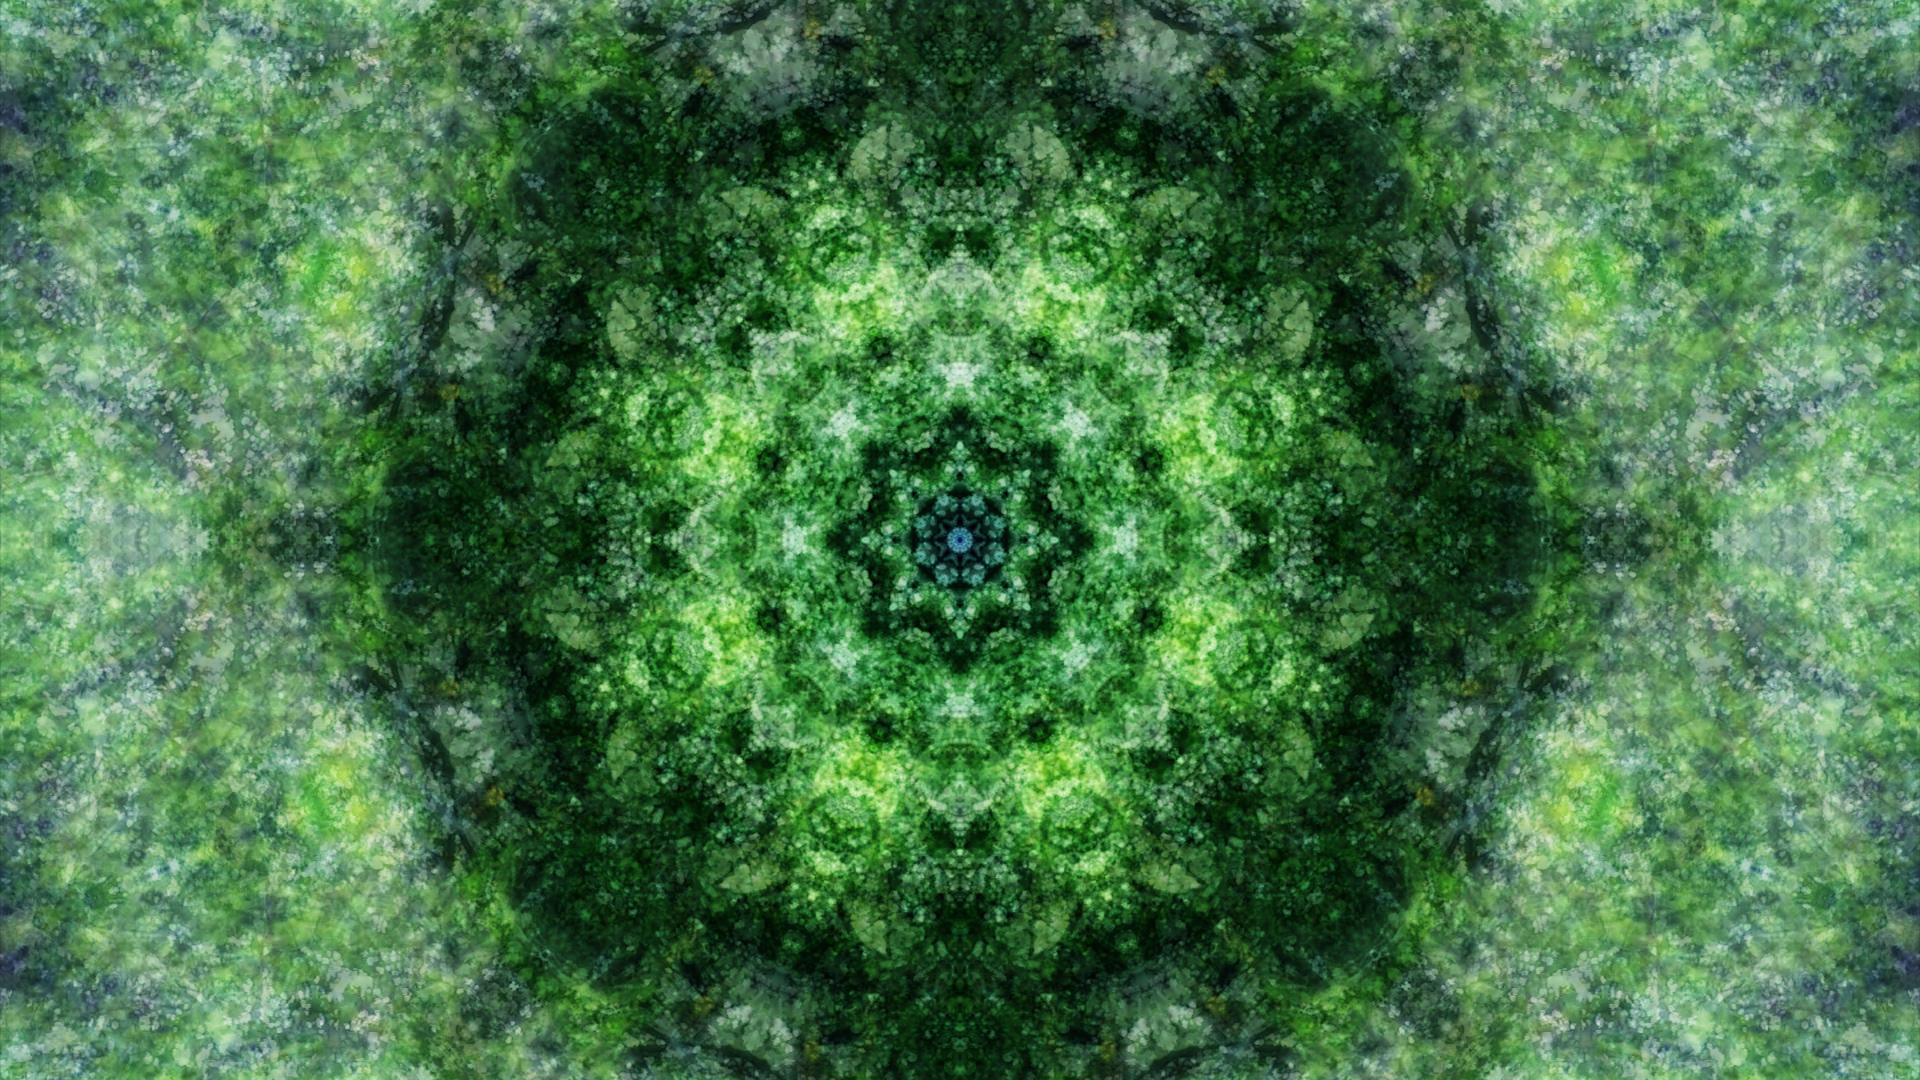 Emitting Velocity - Mohican Forest by Matt Swift Still 6